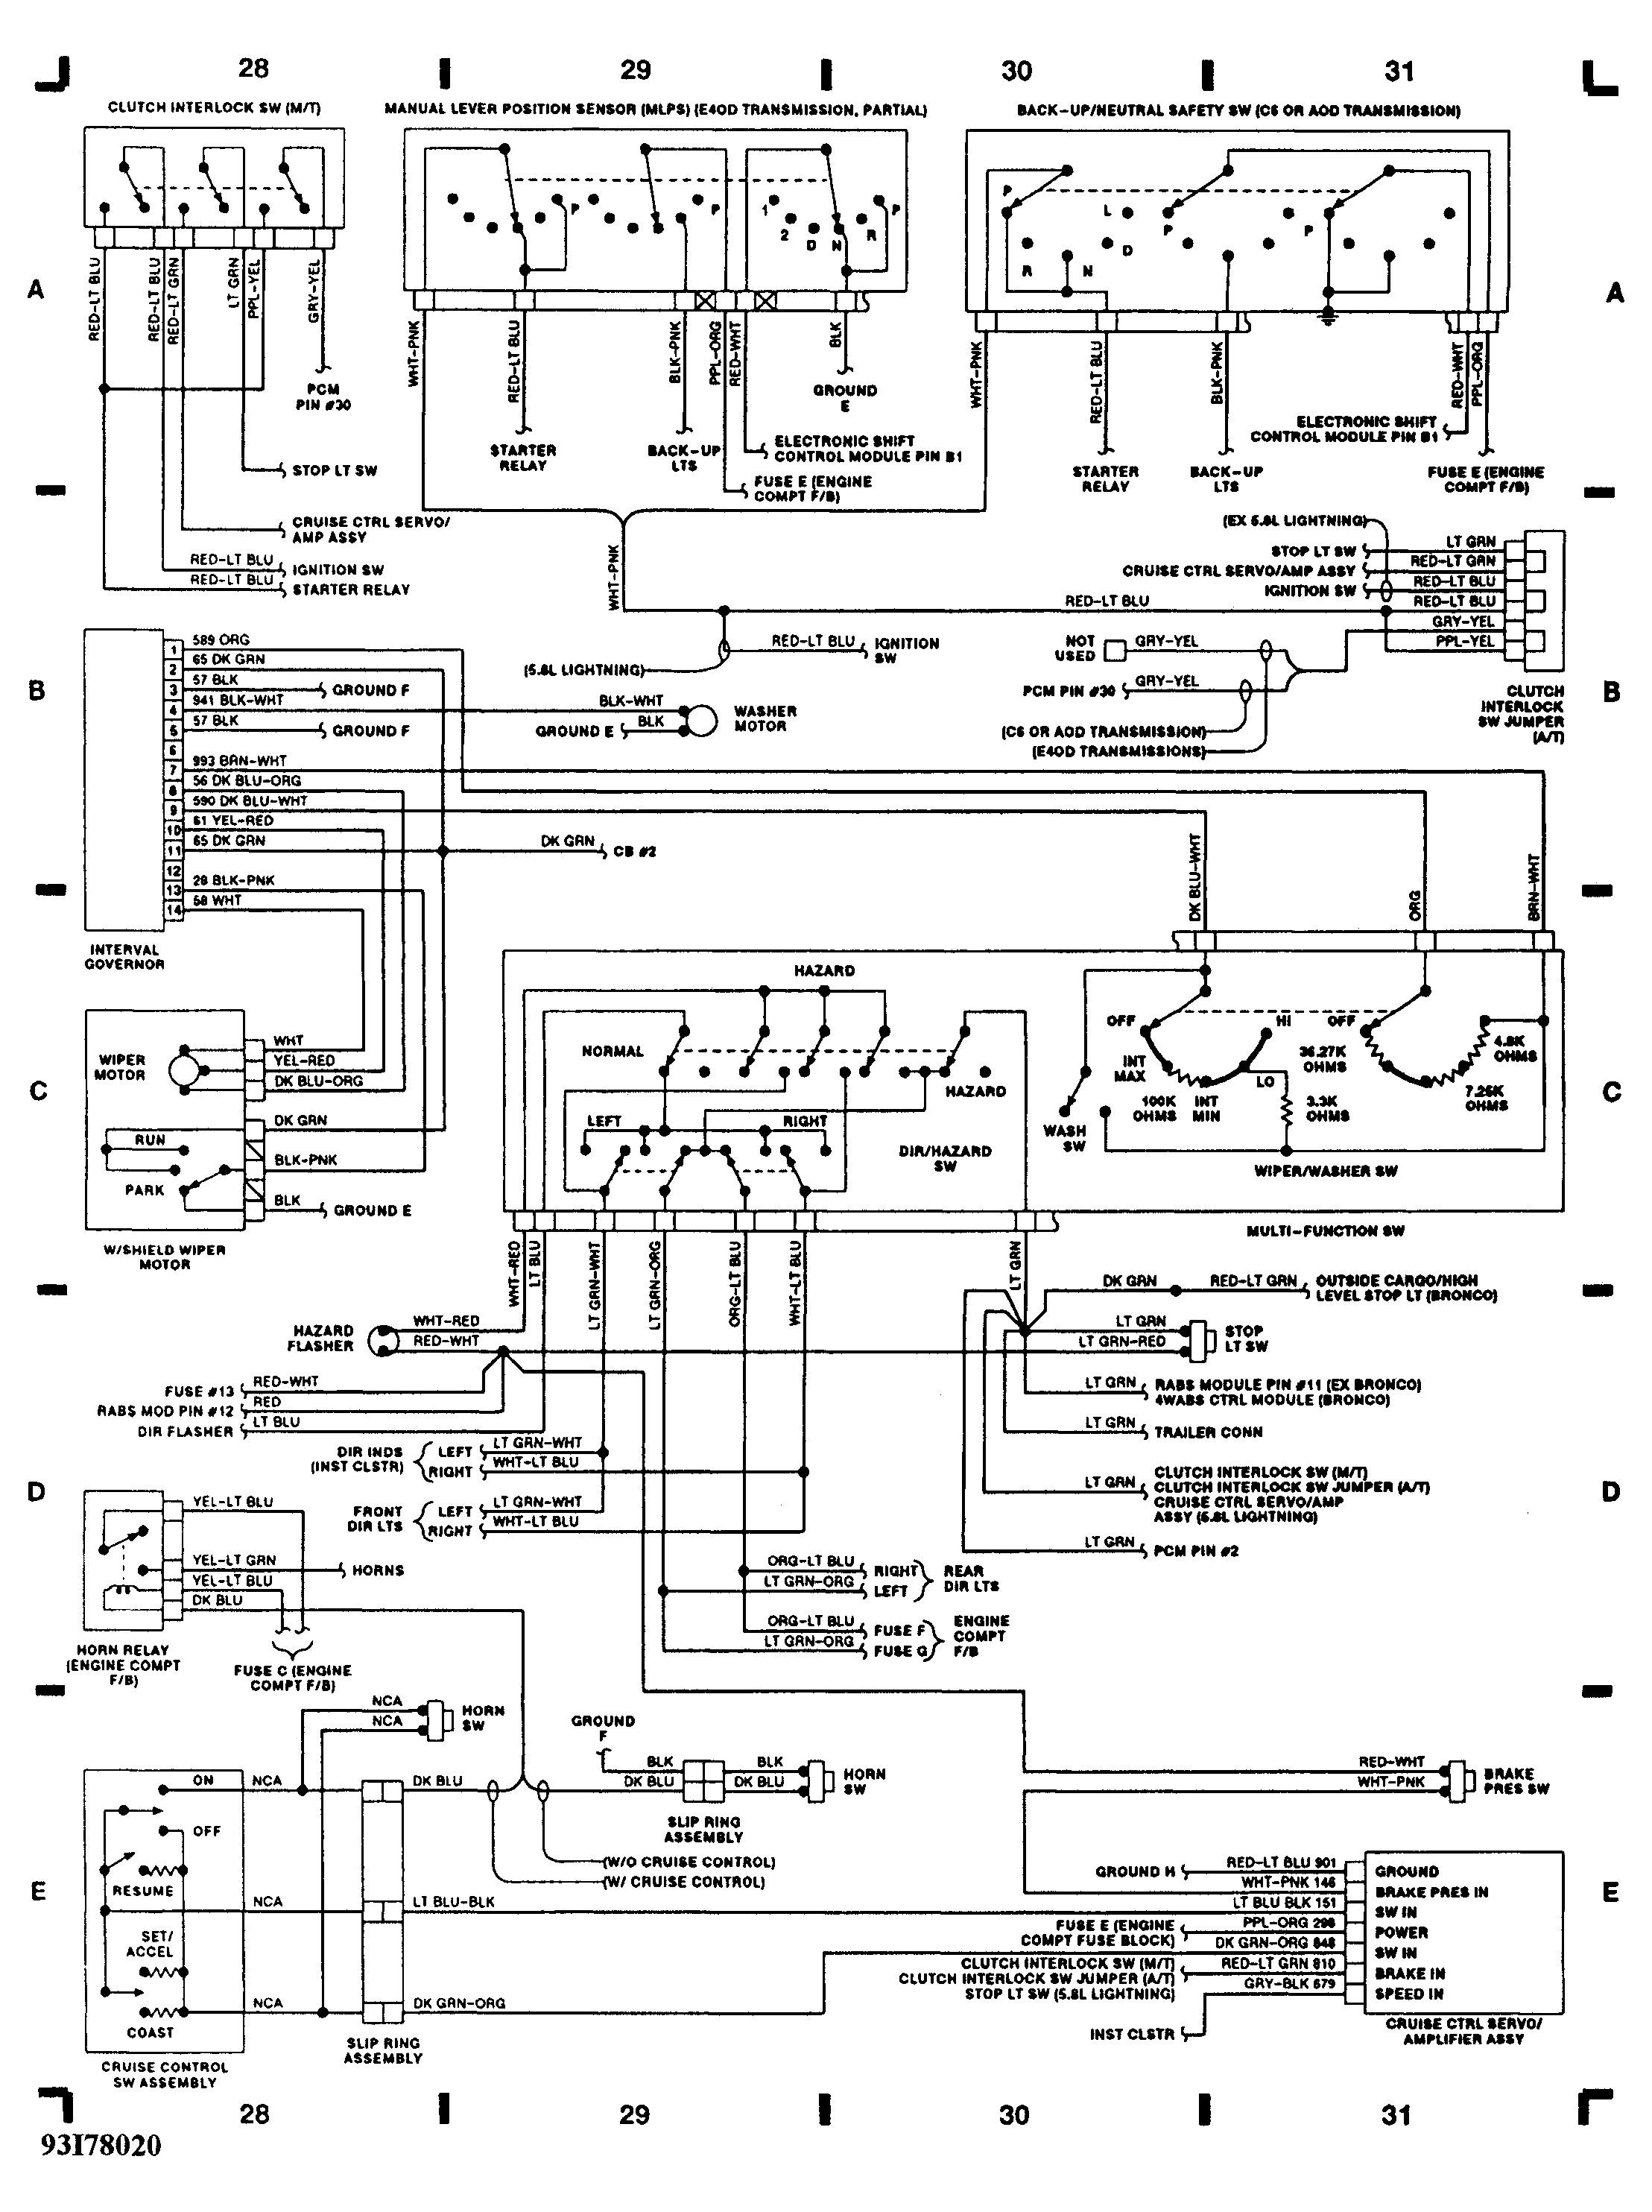 Diy Wiring Harness 2002 6 0 Engine - All Wiring Diagram on